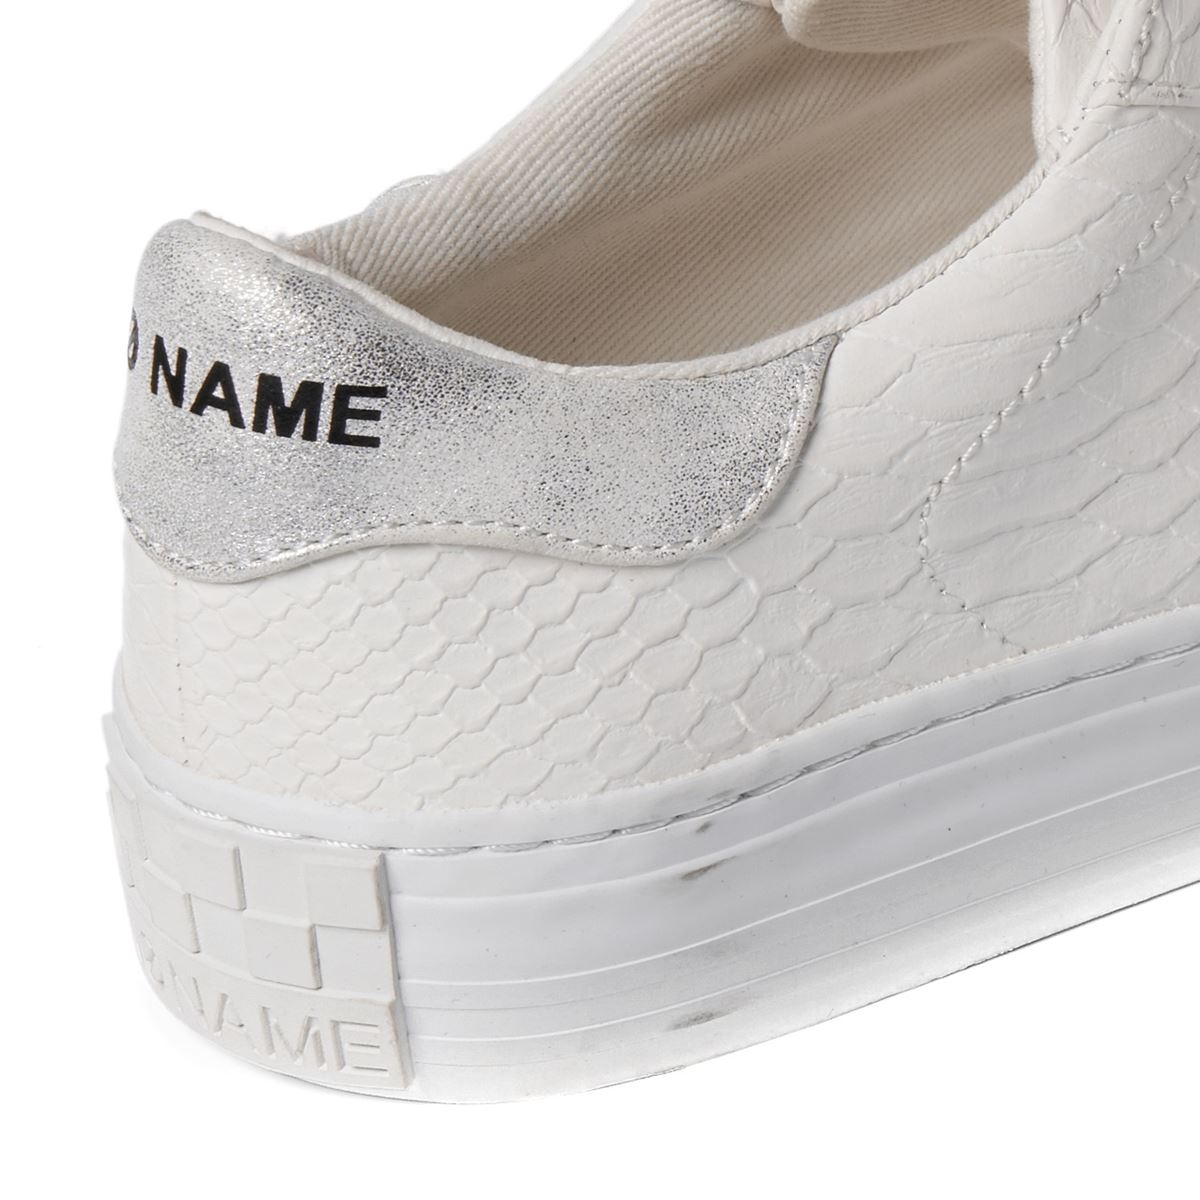 NO NAME ノーネーム アルカデ ホワイト ARCADE-02144